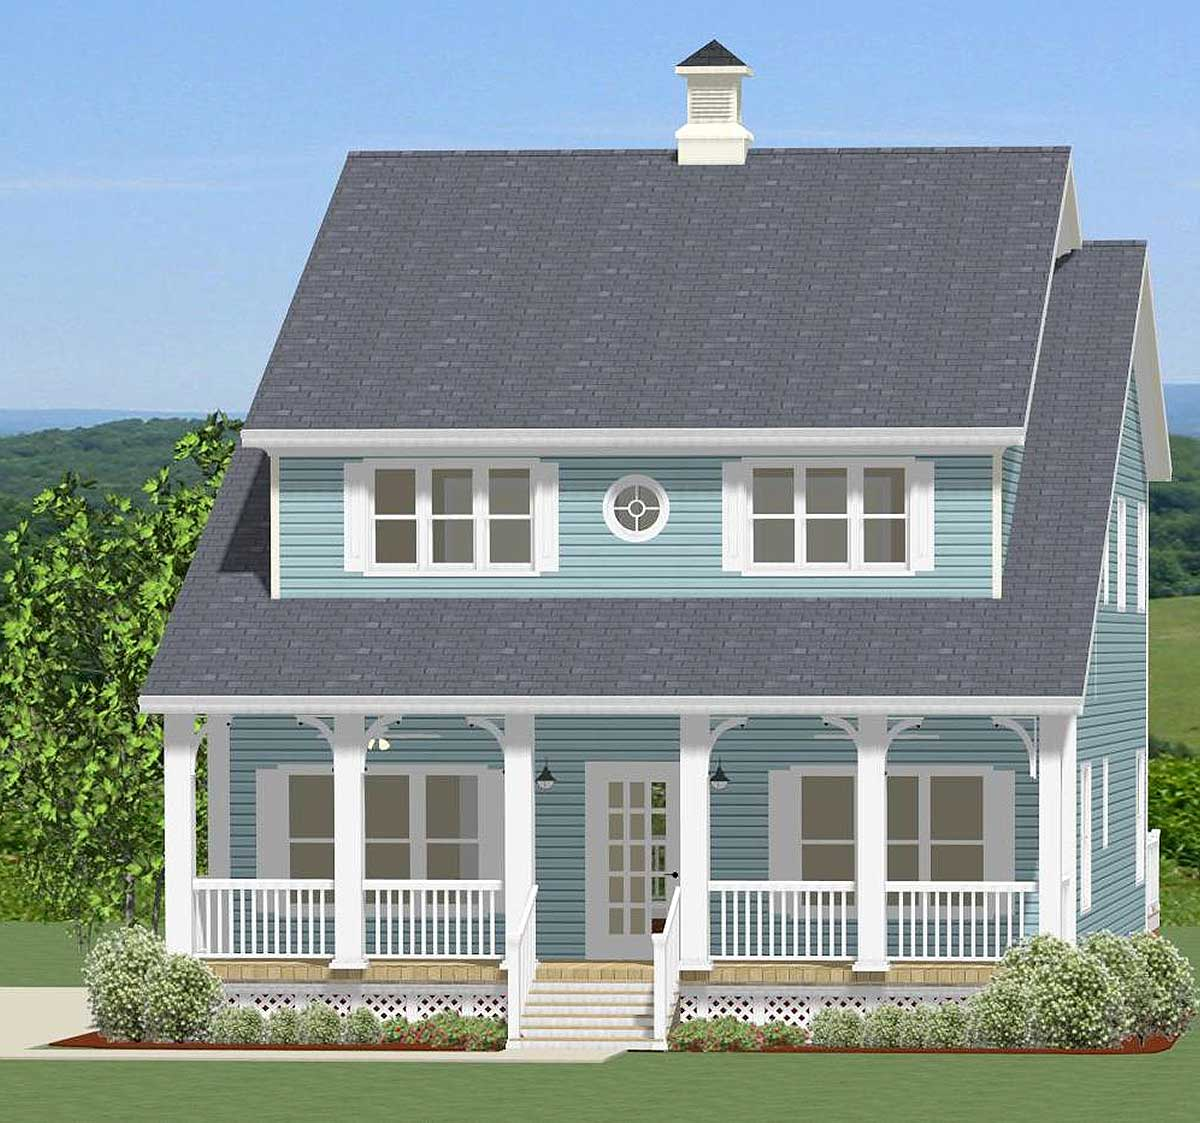 Five Bedroom Country House Plan - 46275LA